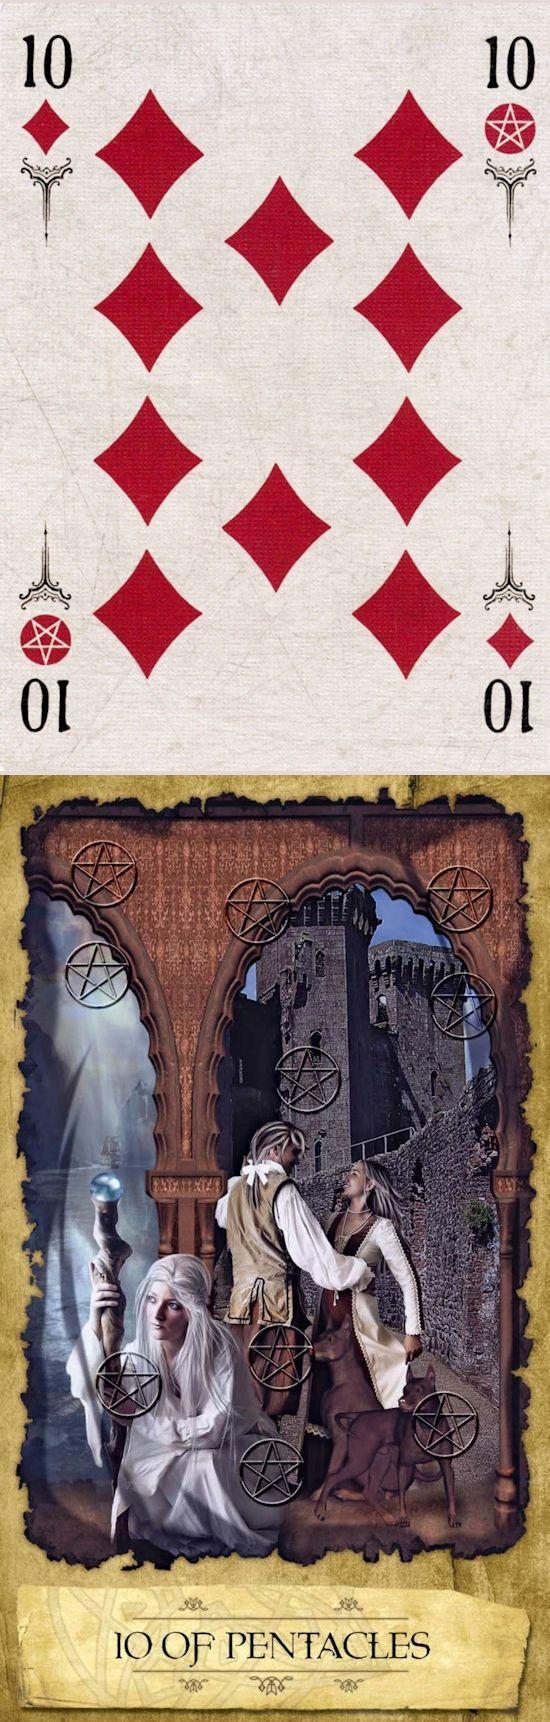 Ten of Pentacles: legacy and failure (reverse). Arcana Tarot Tarot deck and Mystic dreamer Tarot deck: tarot free tarot, tarotkindle vs tarottablecloth. The best predictions anchor chart and psychic readings questions.